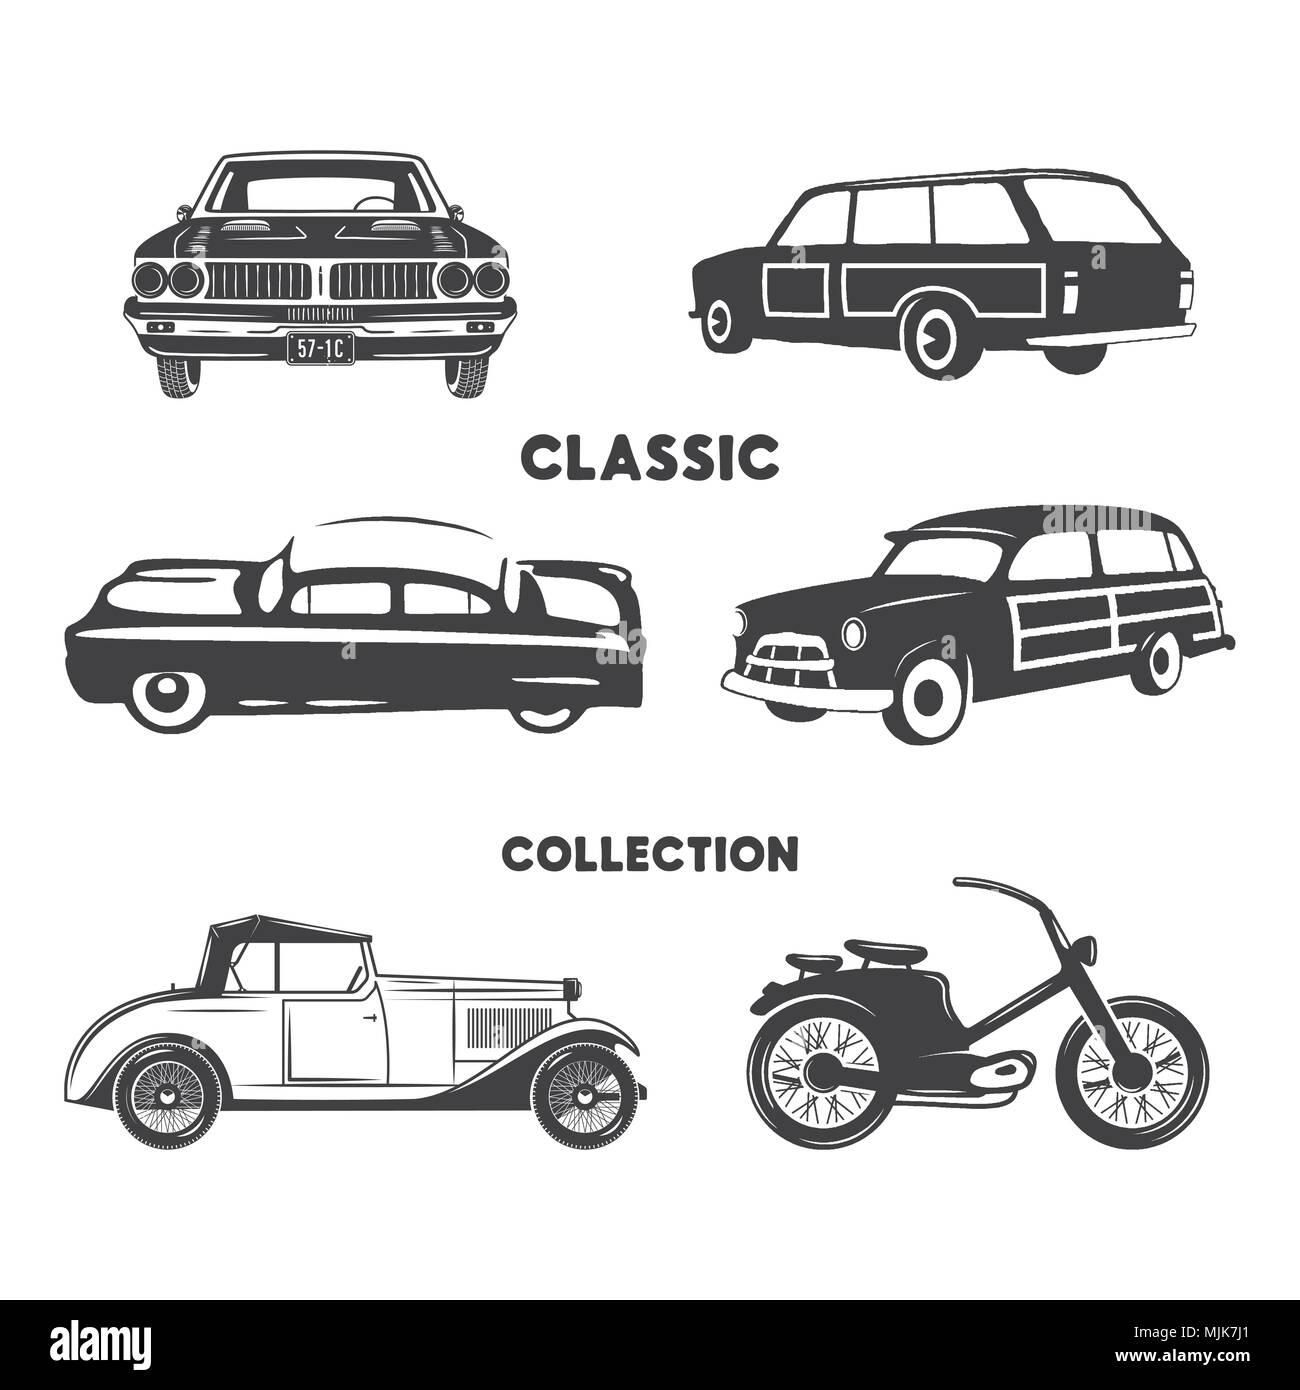 Classic Cars Vintage Car Icons Symbols Setntage Hand Drawn Cars